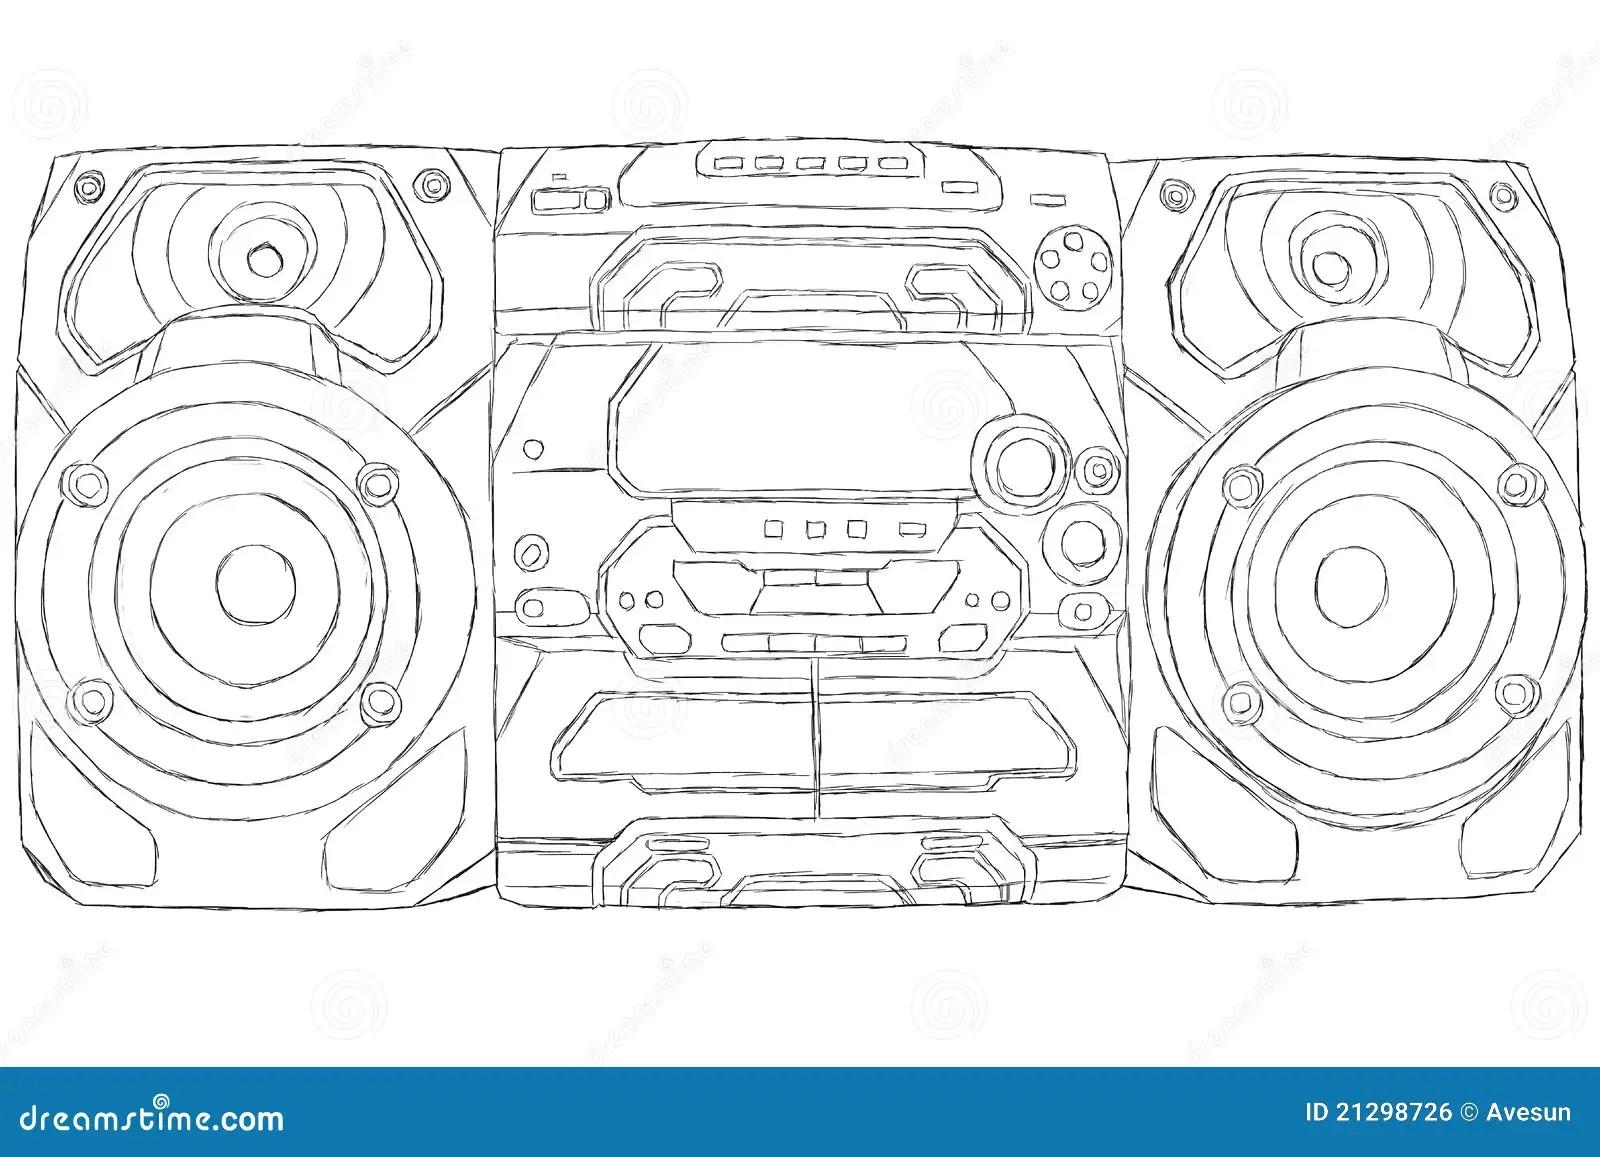 Stereo Cd Player Jukebox Phonograph Record Sketch Coloring